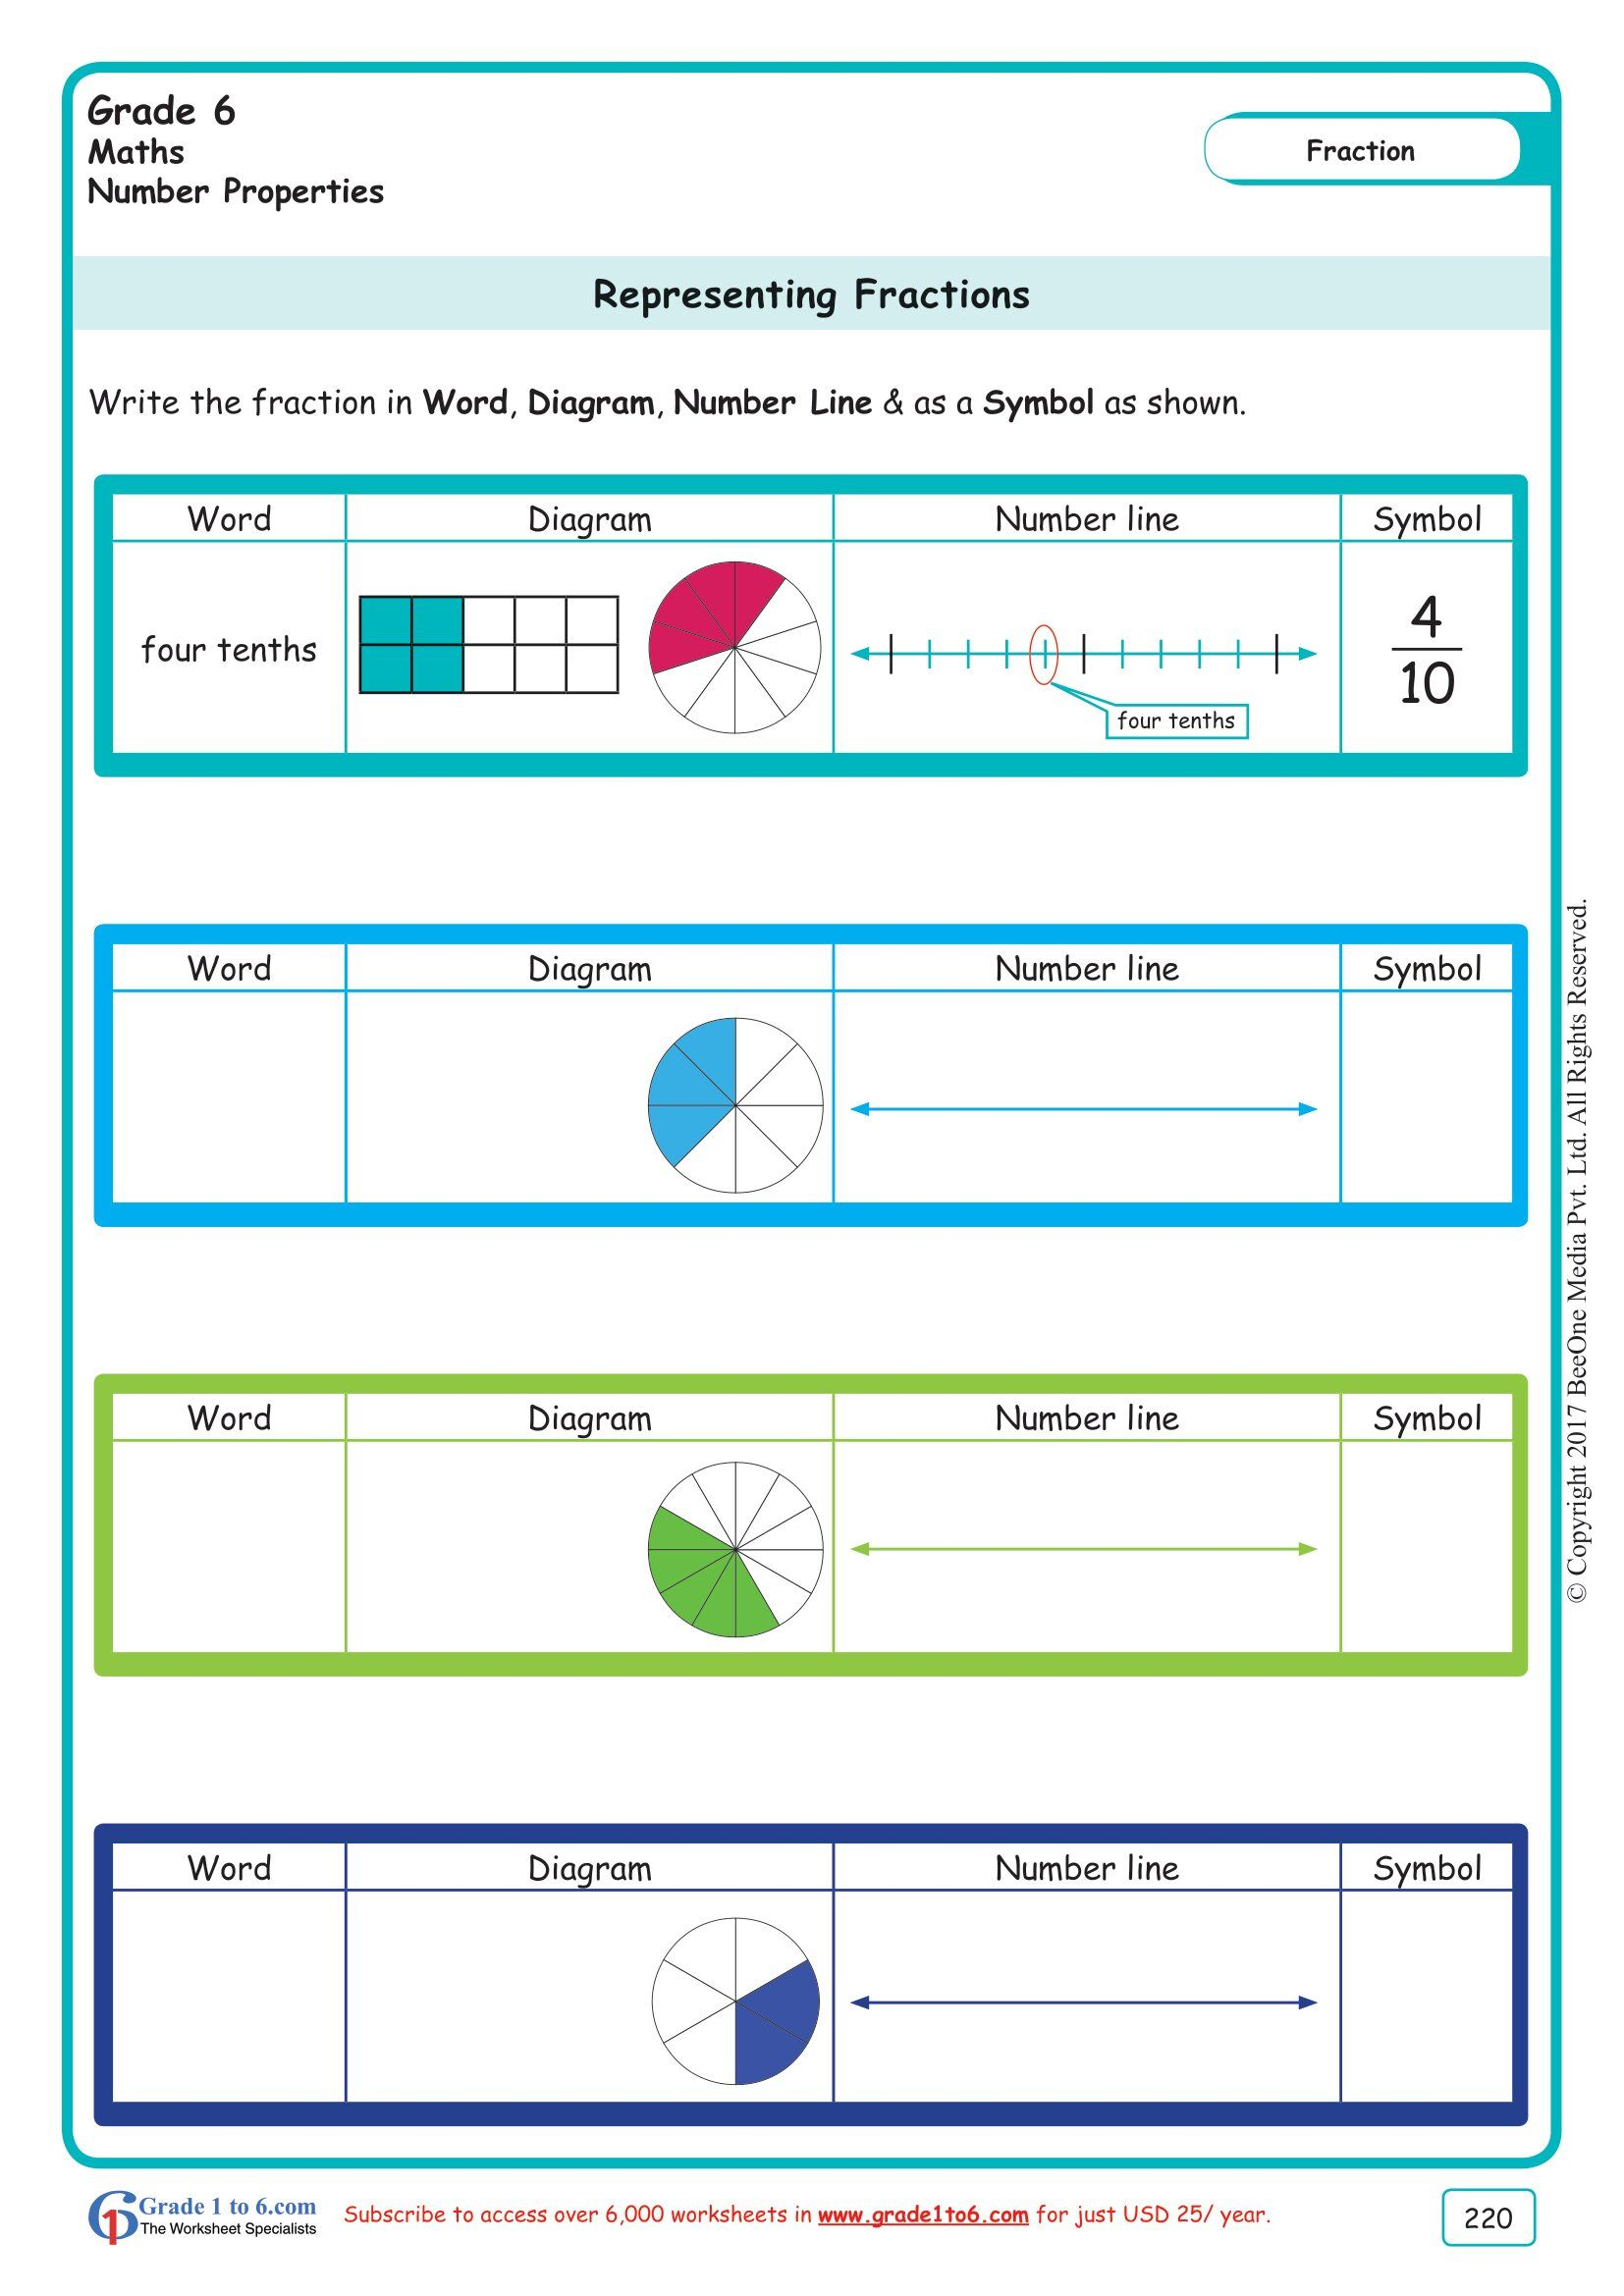 Worksheet Grade 6 Math Representing Fractions In